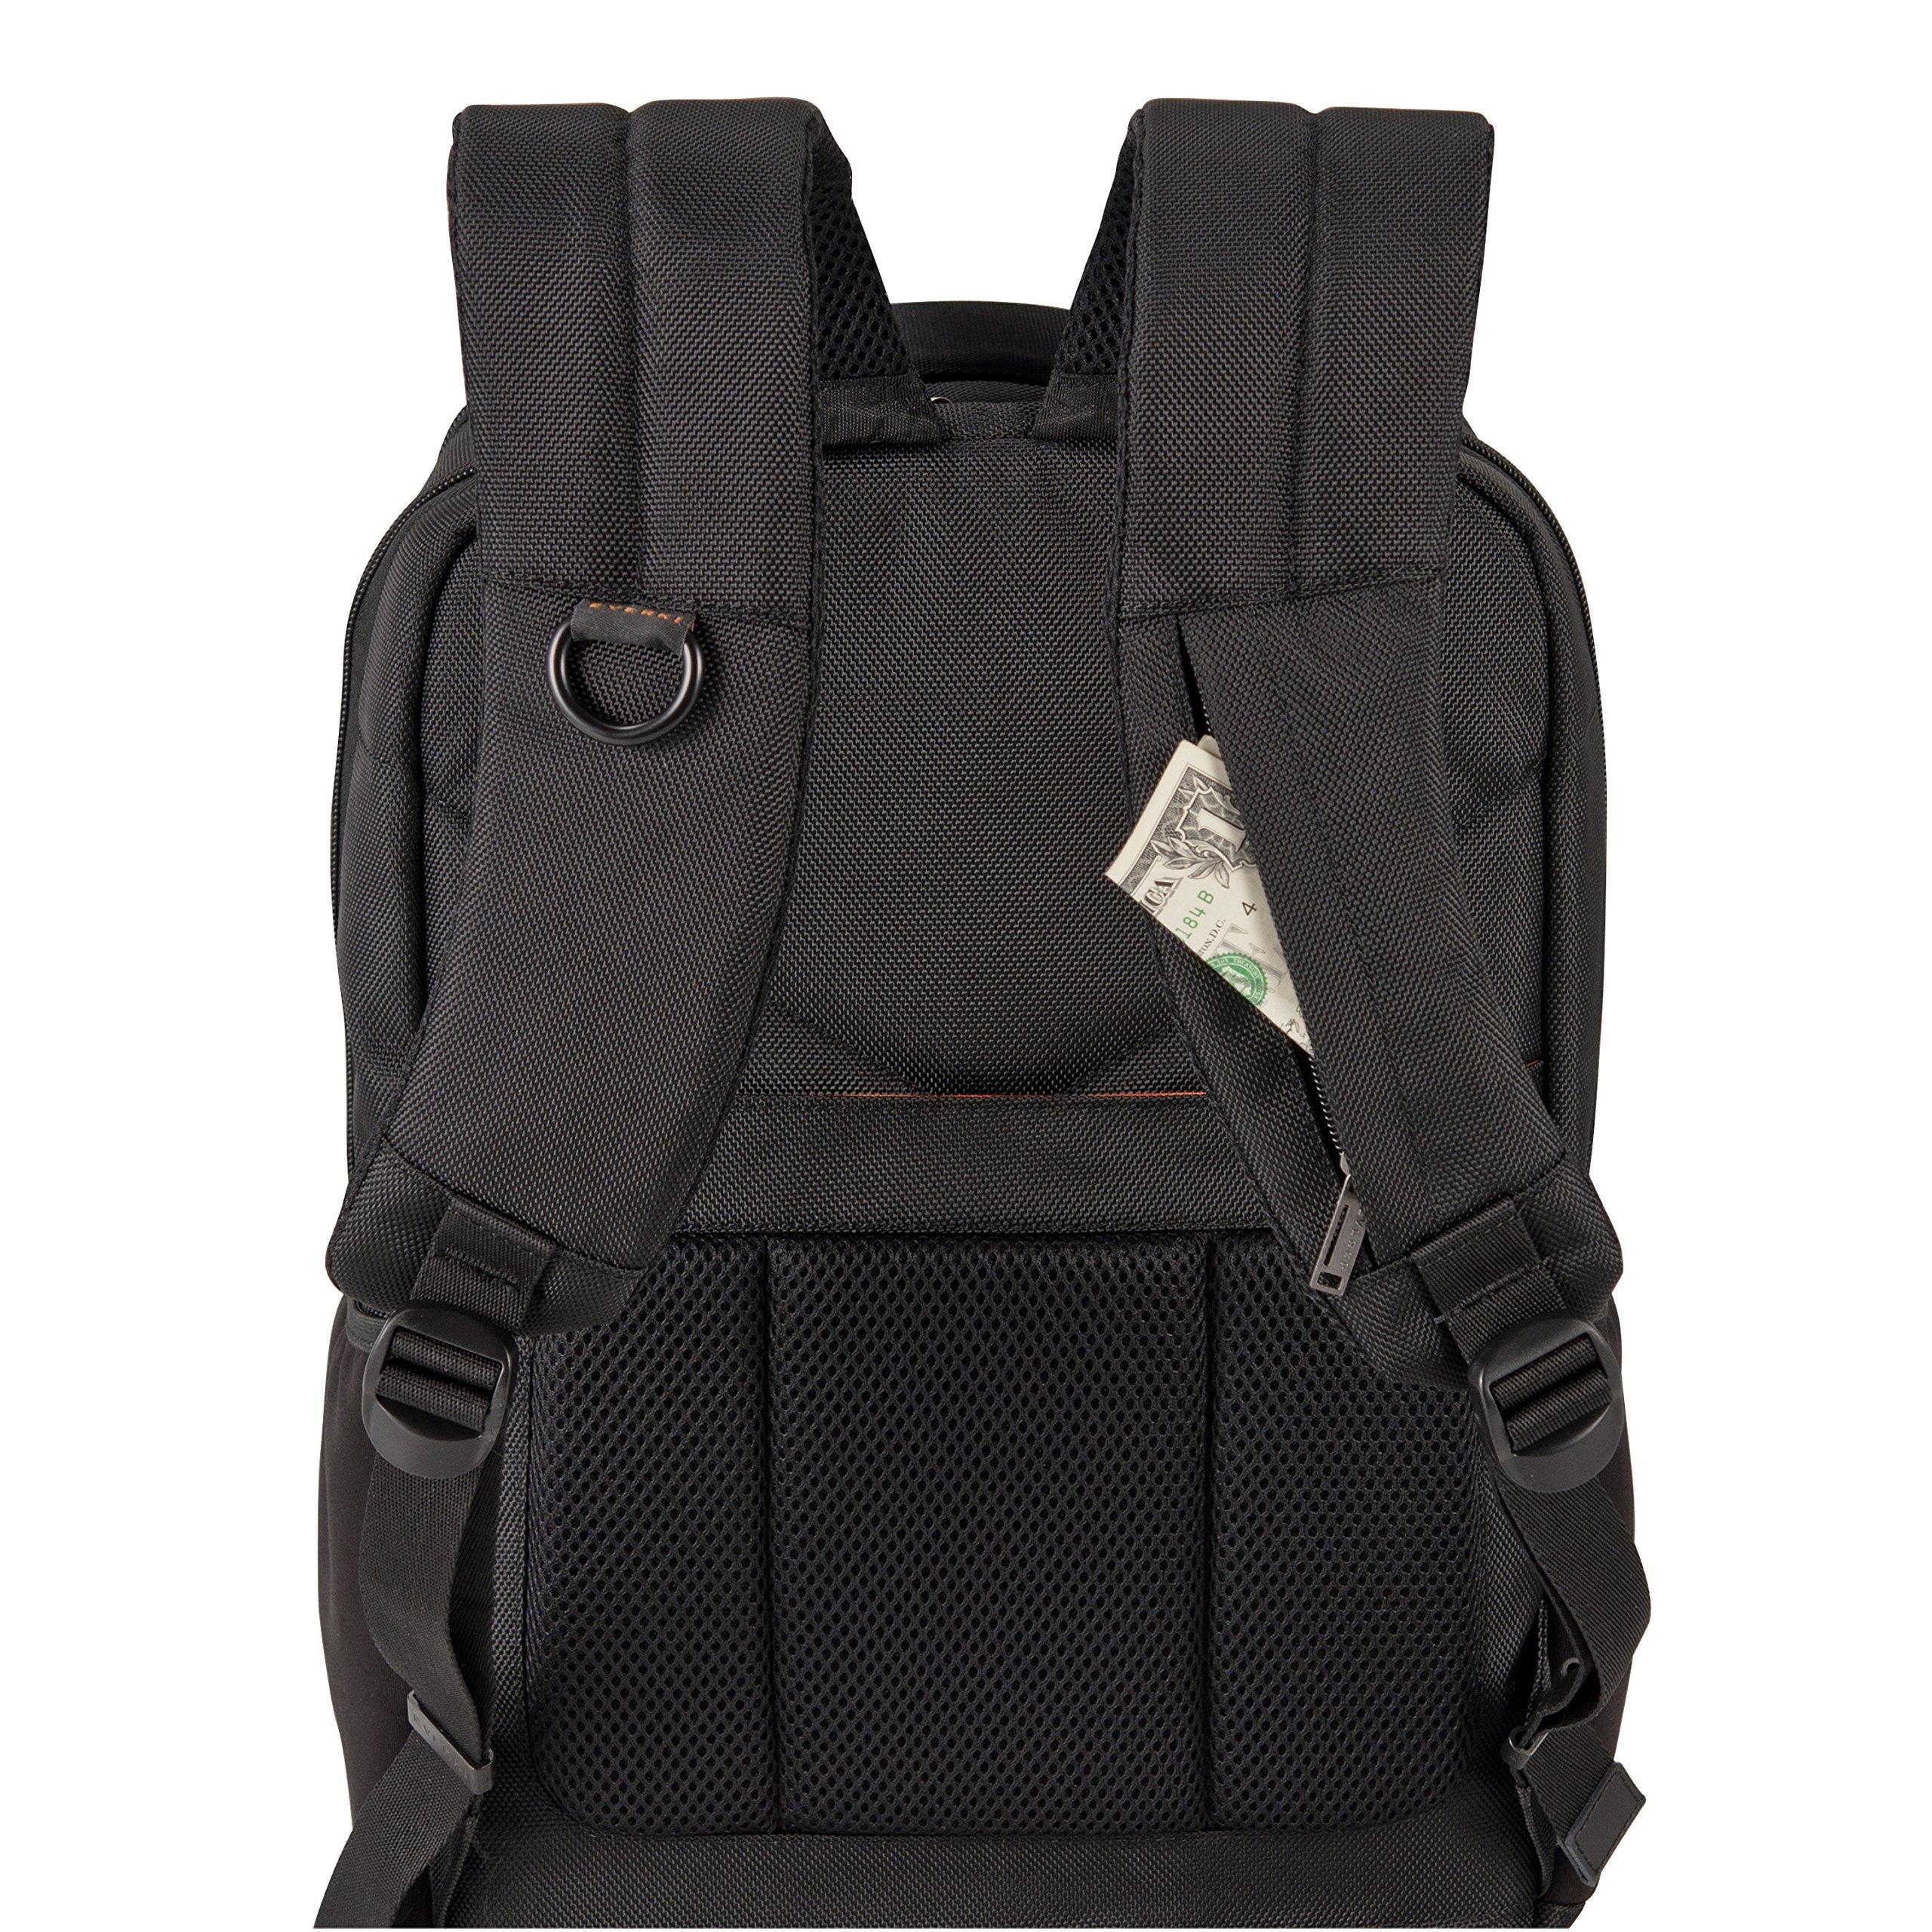 Everki Studio Slim Laptop Backpack for upto 14.1-Inch Laptops/15-Inch MacBook Pro (EKP118) by Everki (Image #8)